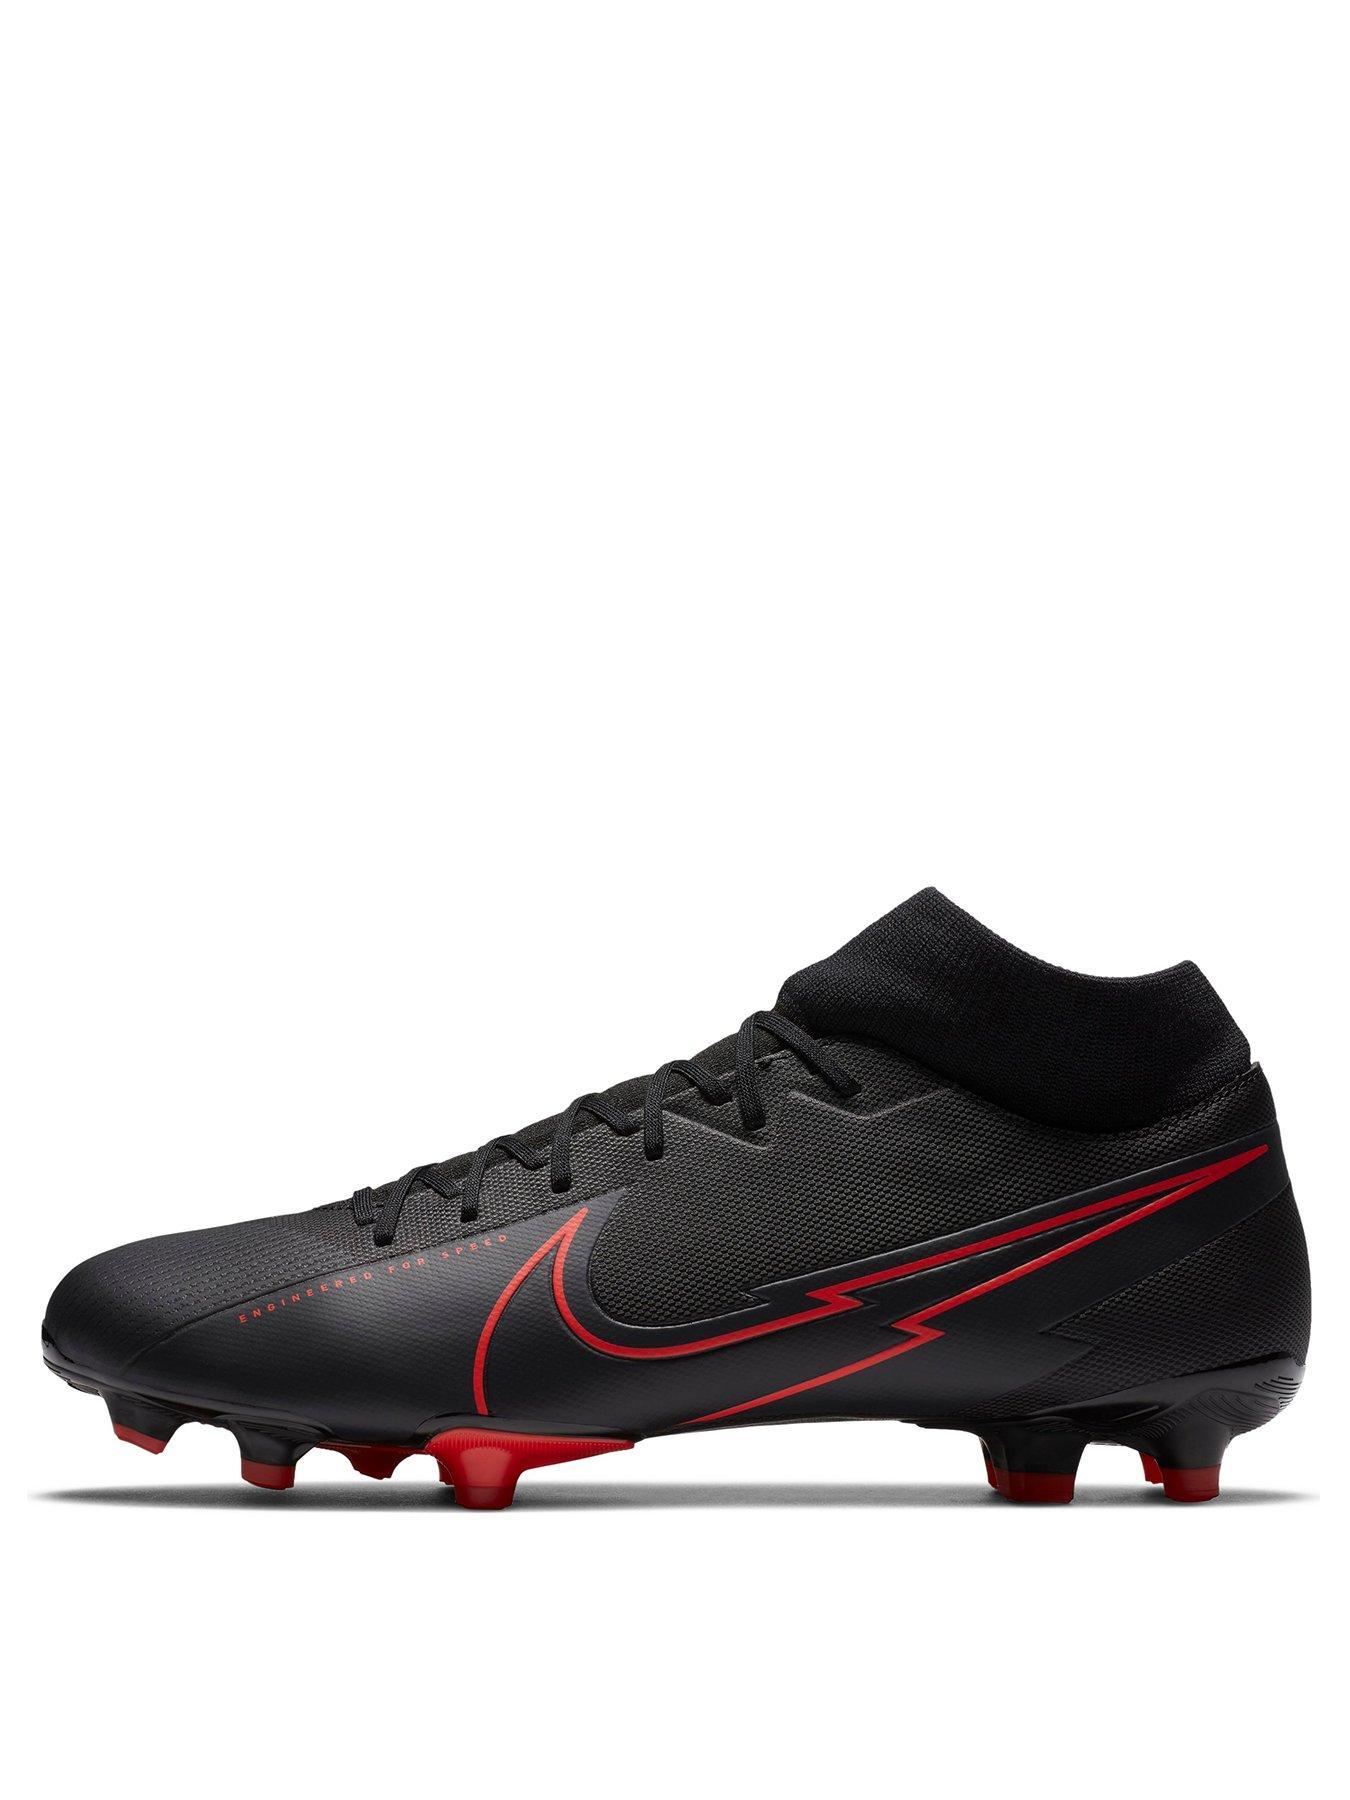 football boots ireland online